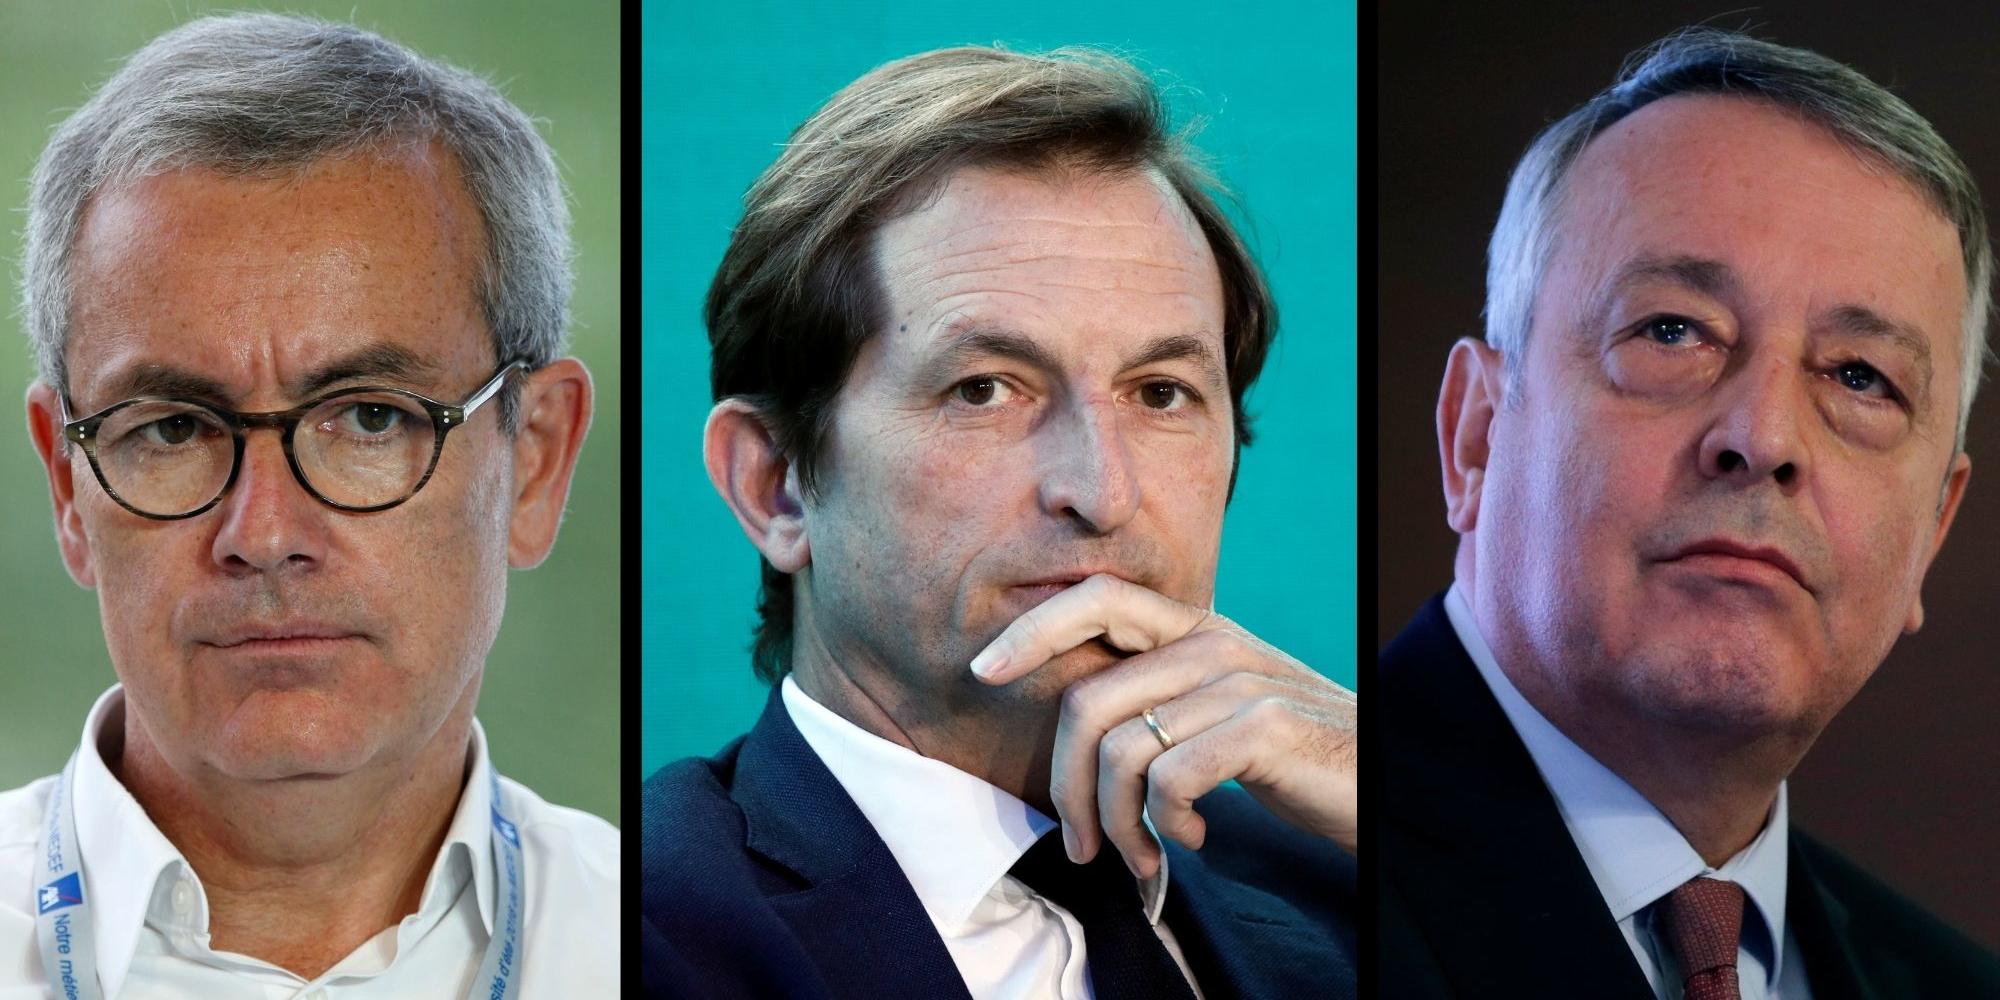 L'affaire Veolia/Suez en quatre actes